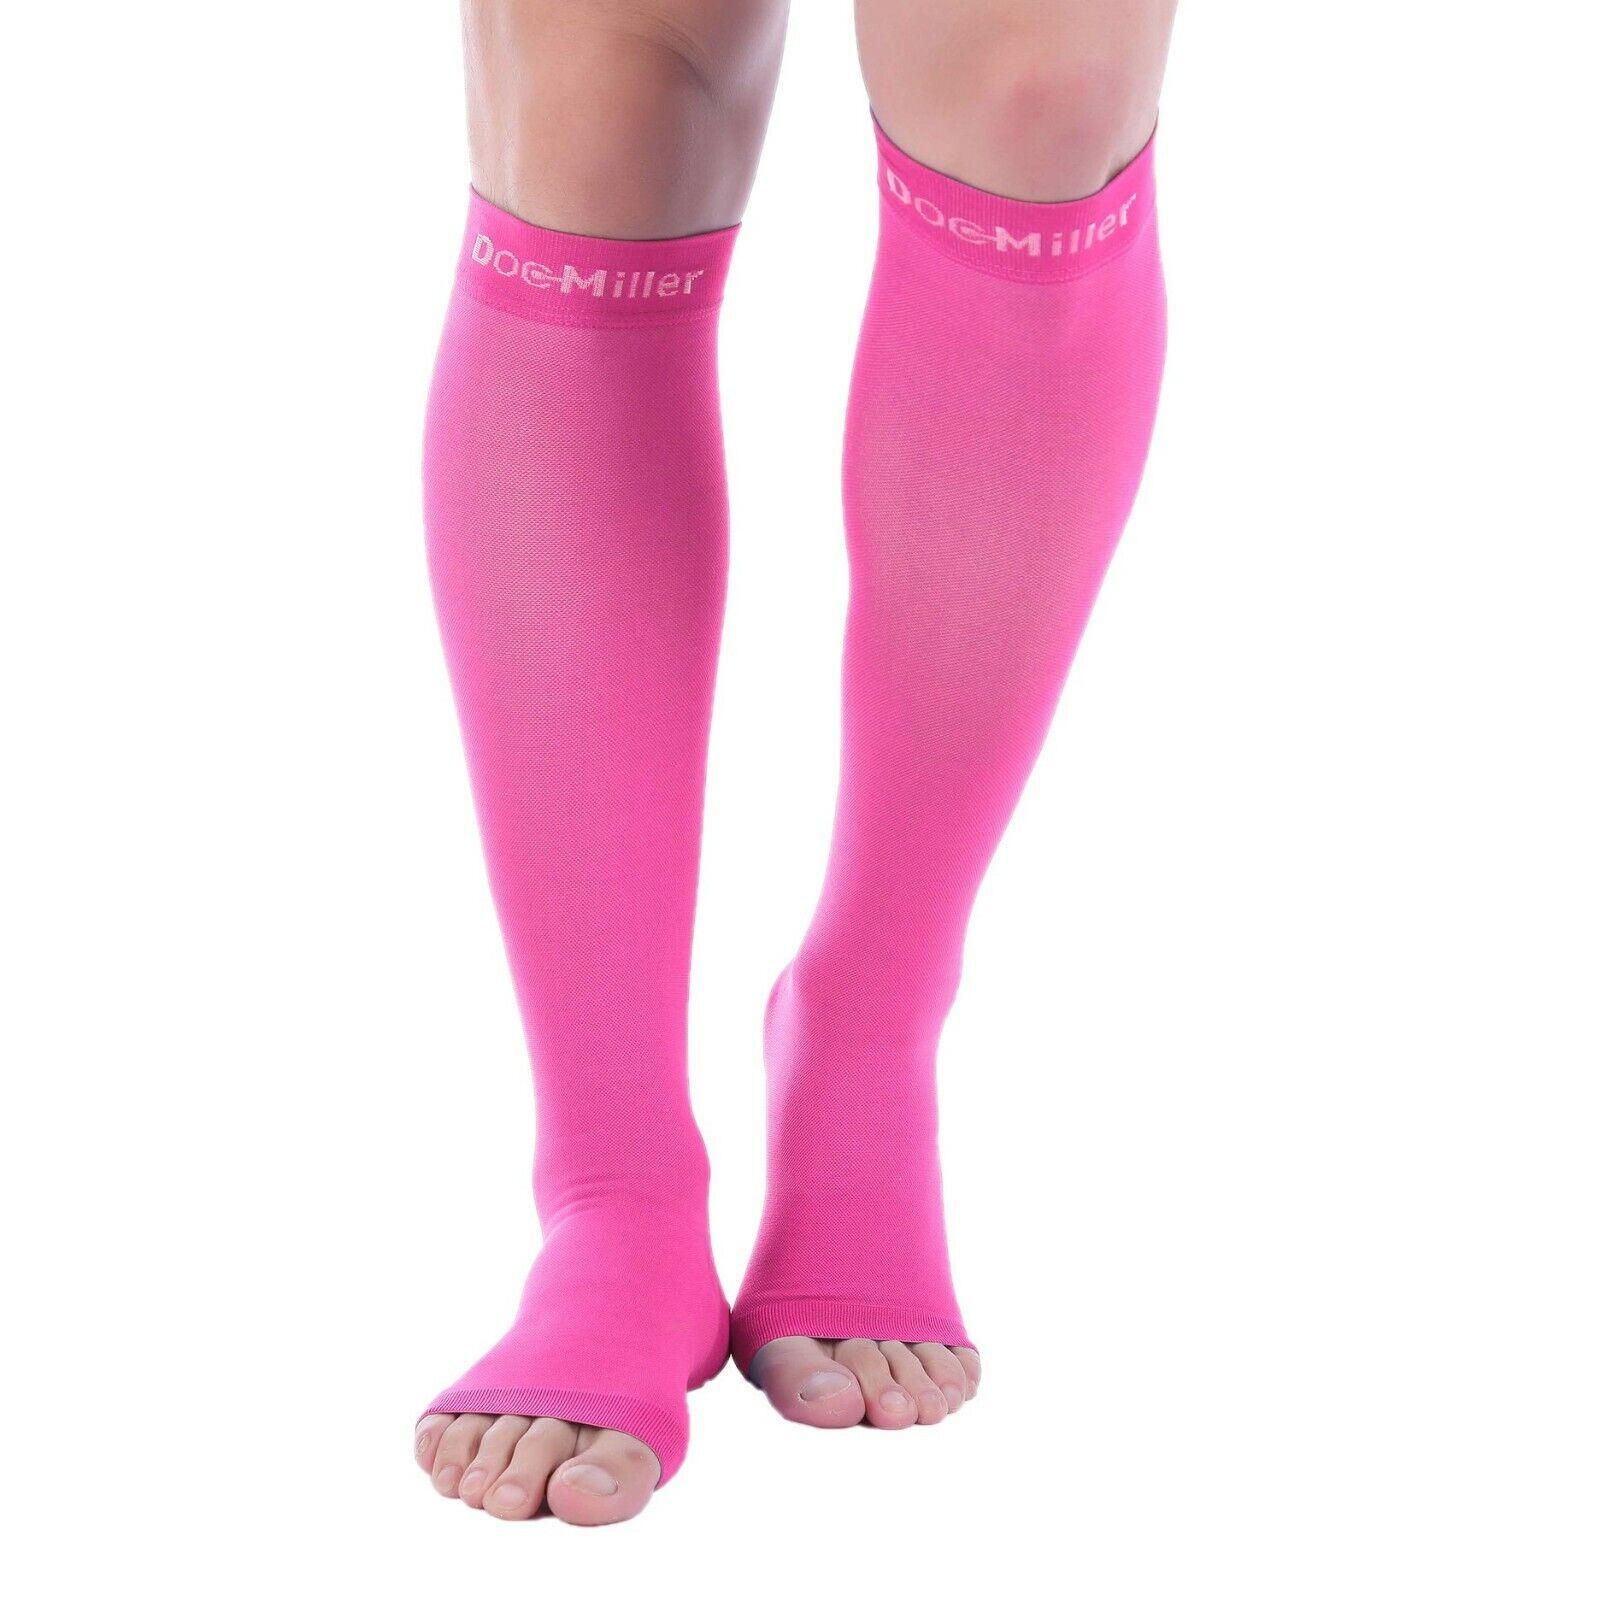 Doc Miller Open Toe Compression Socks 15-20 mmHg Recovery Va